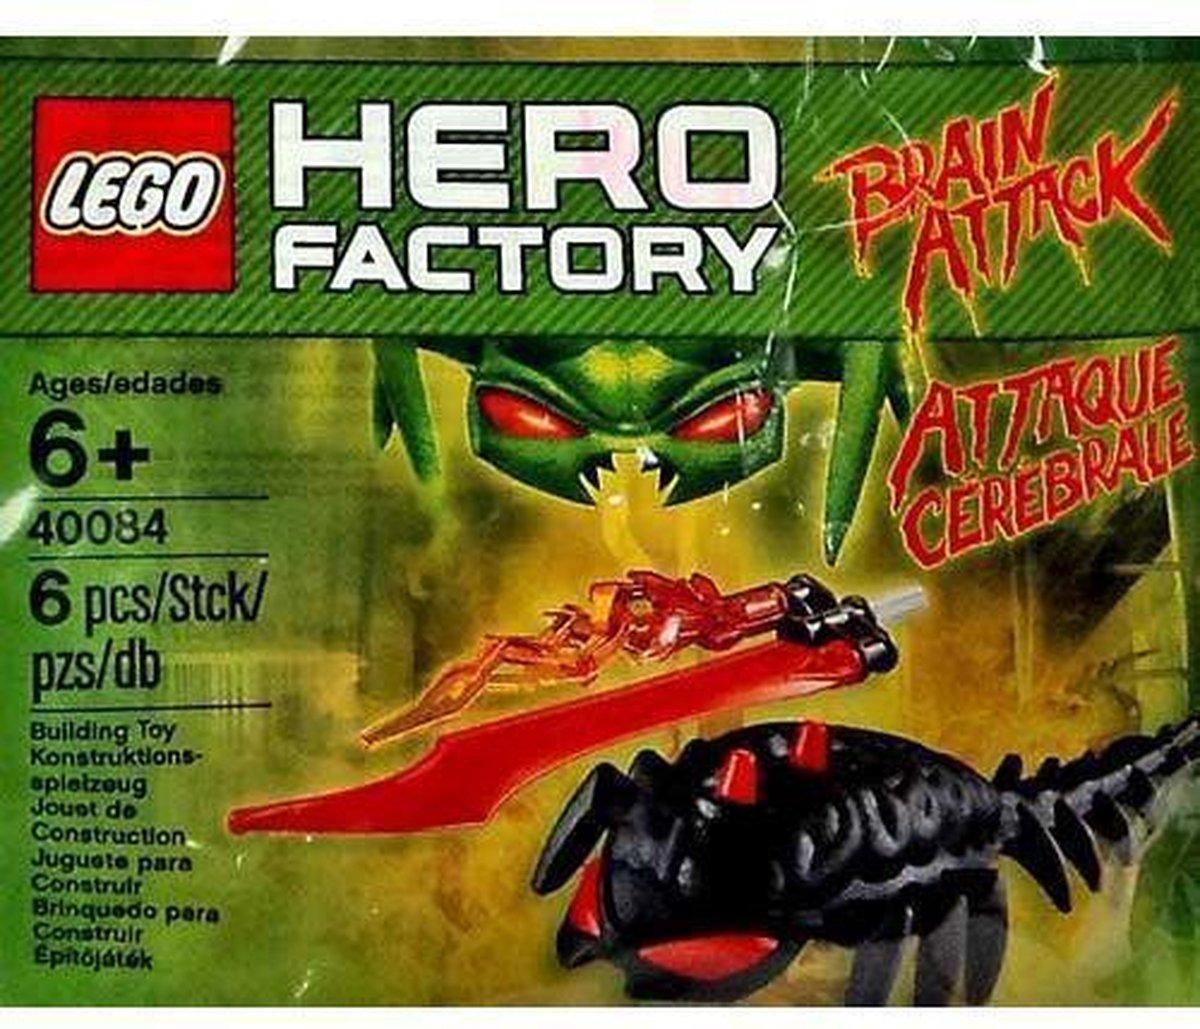 LEGO Hero Factory Brain Attack - 40084 (Polybag)